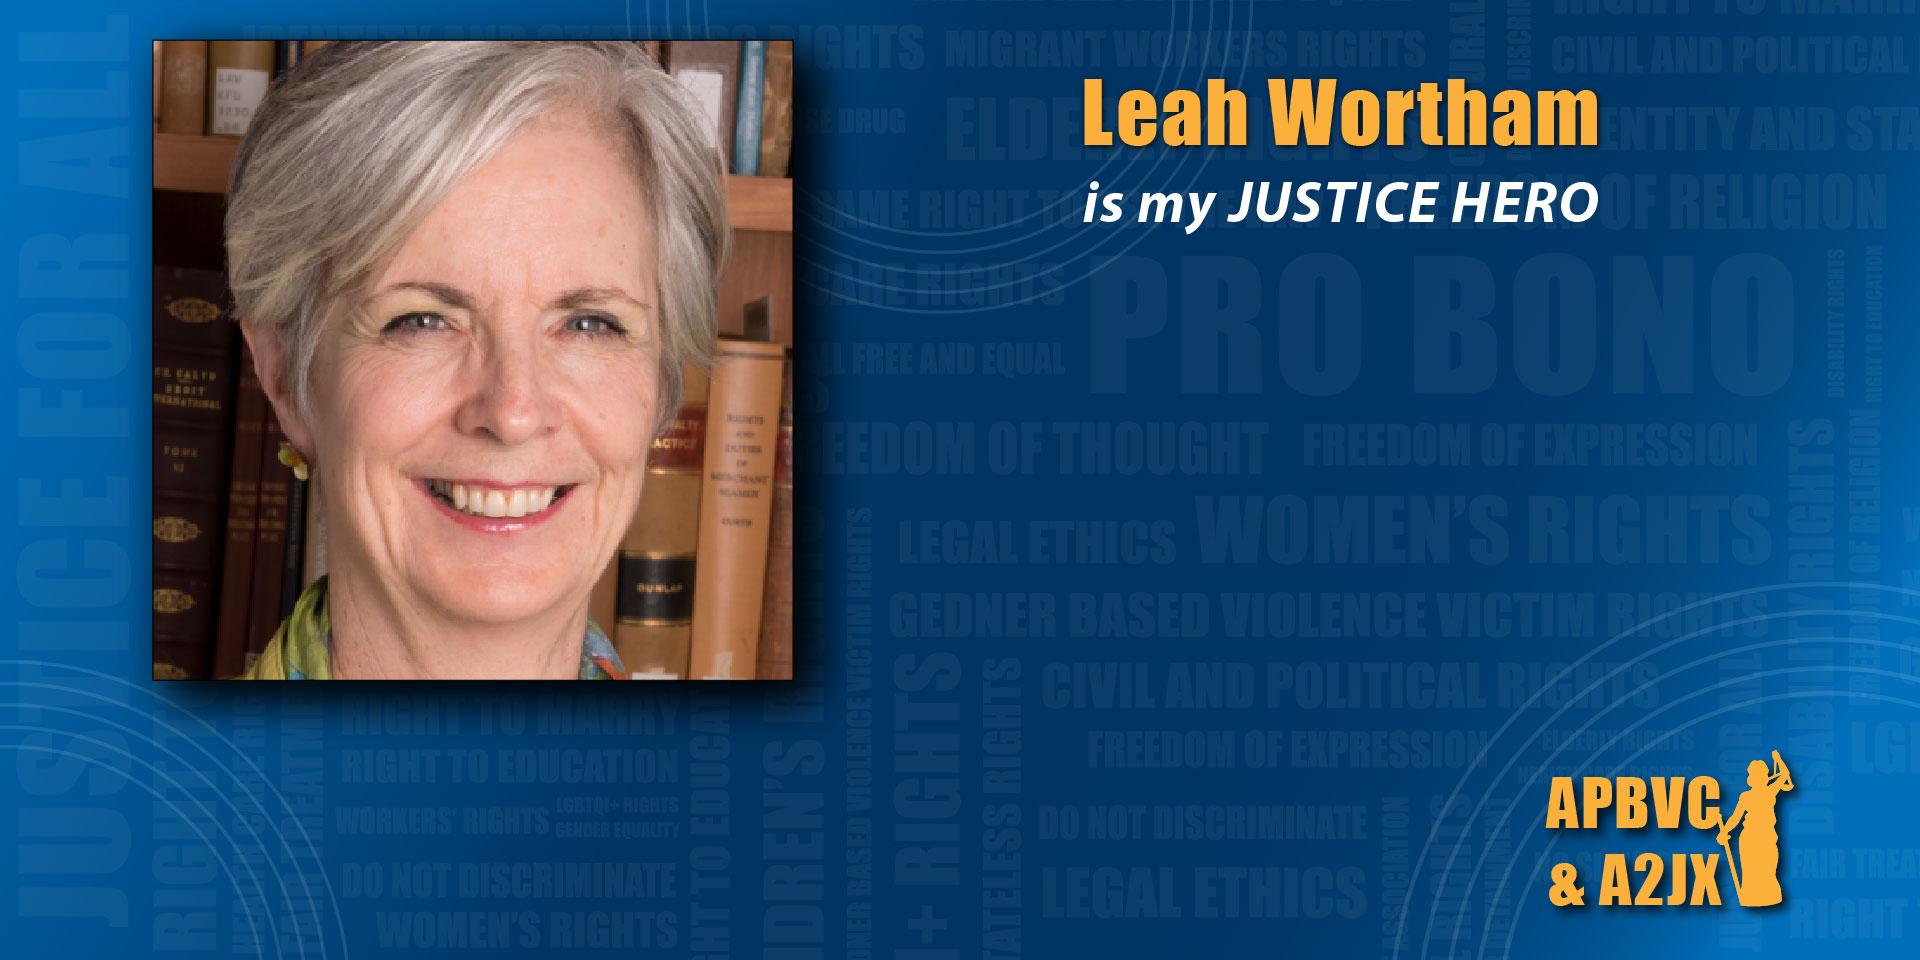 Leah Wortham